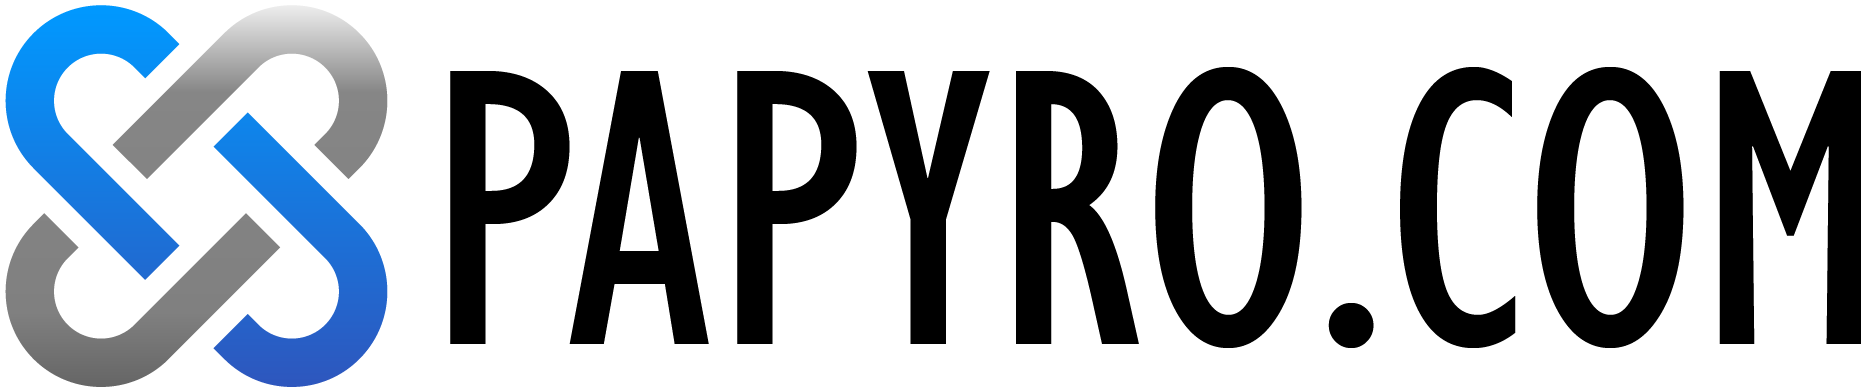 cropped-Papyro-com-02-2